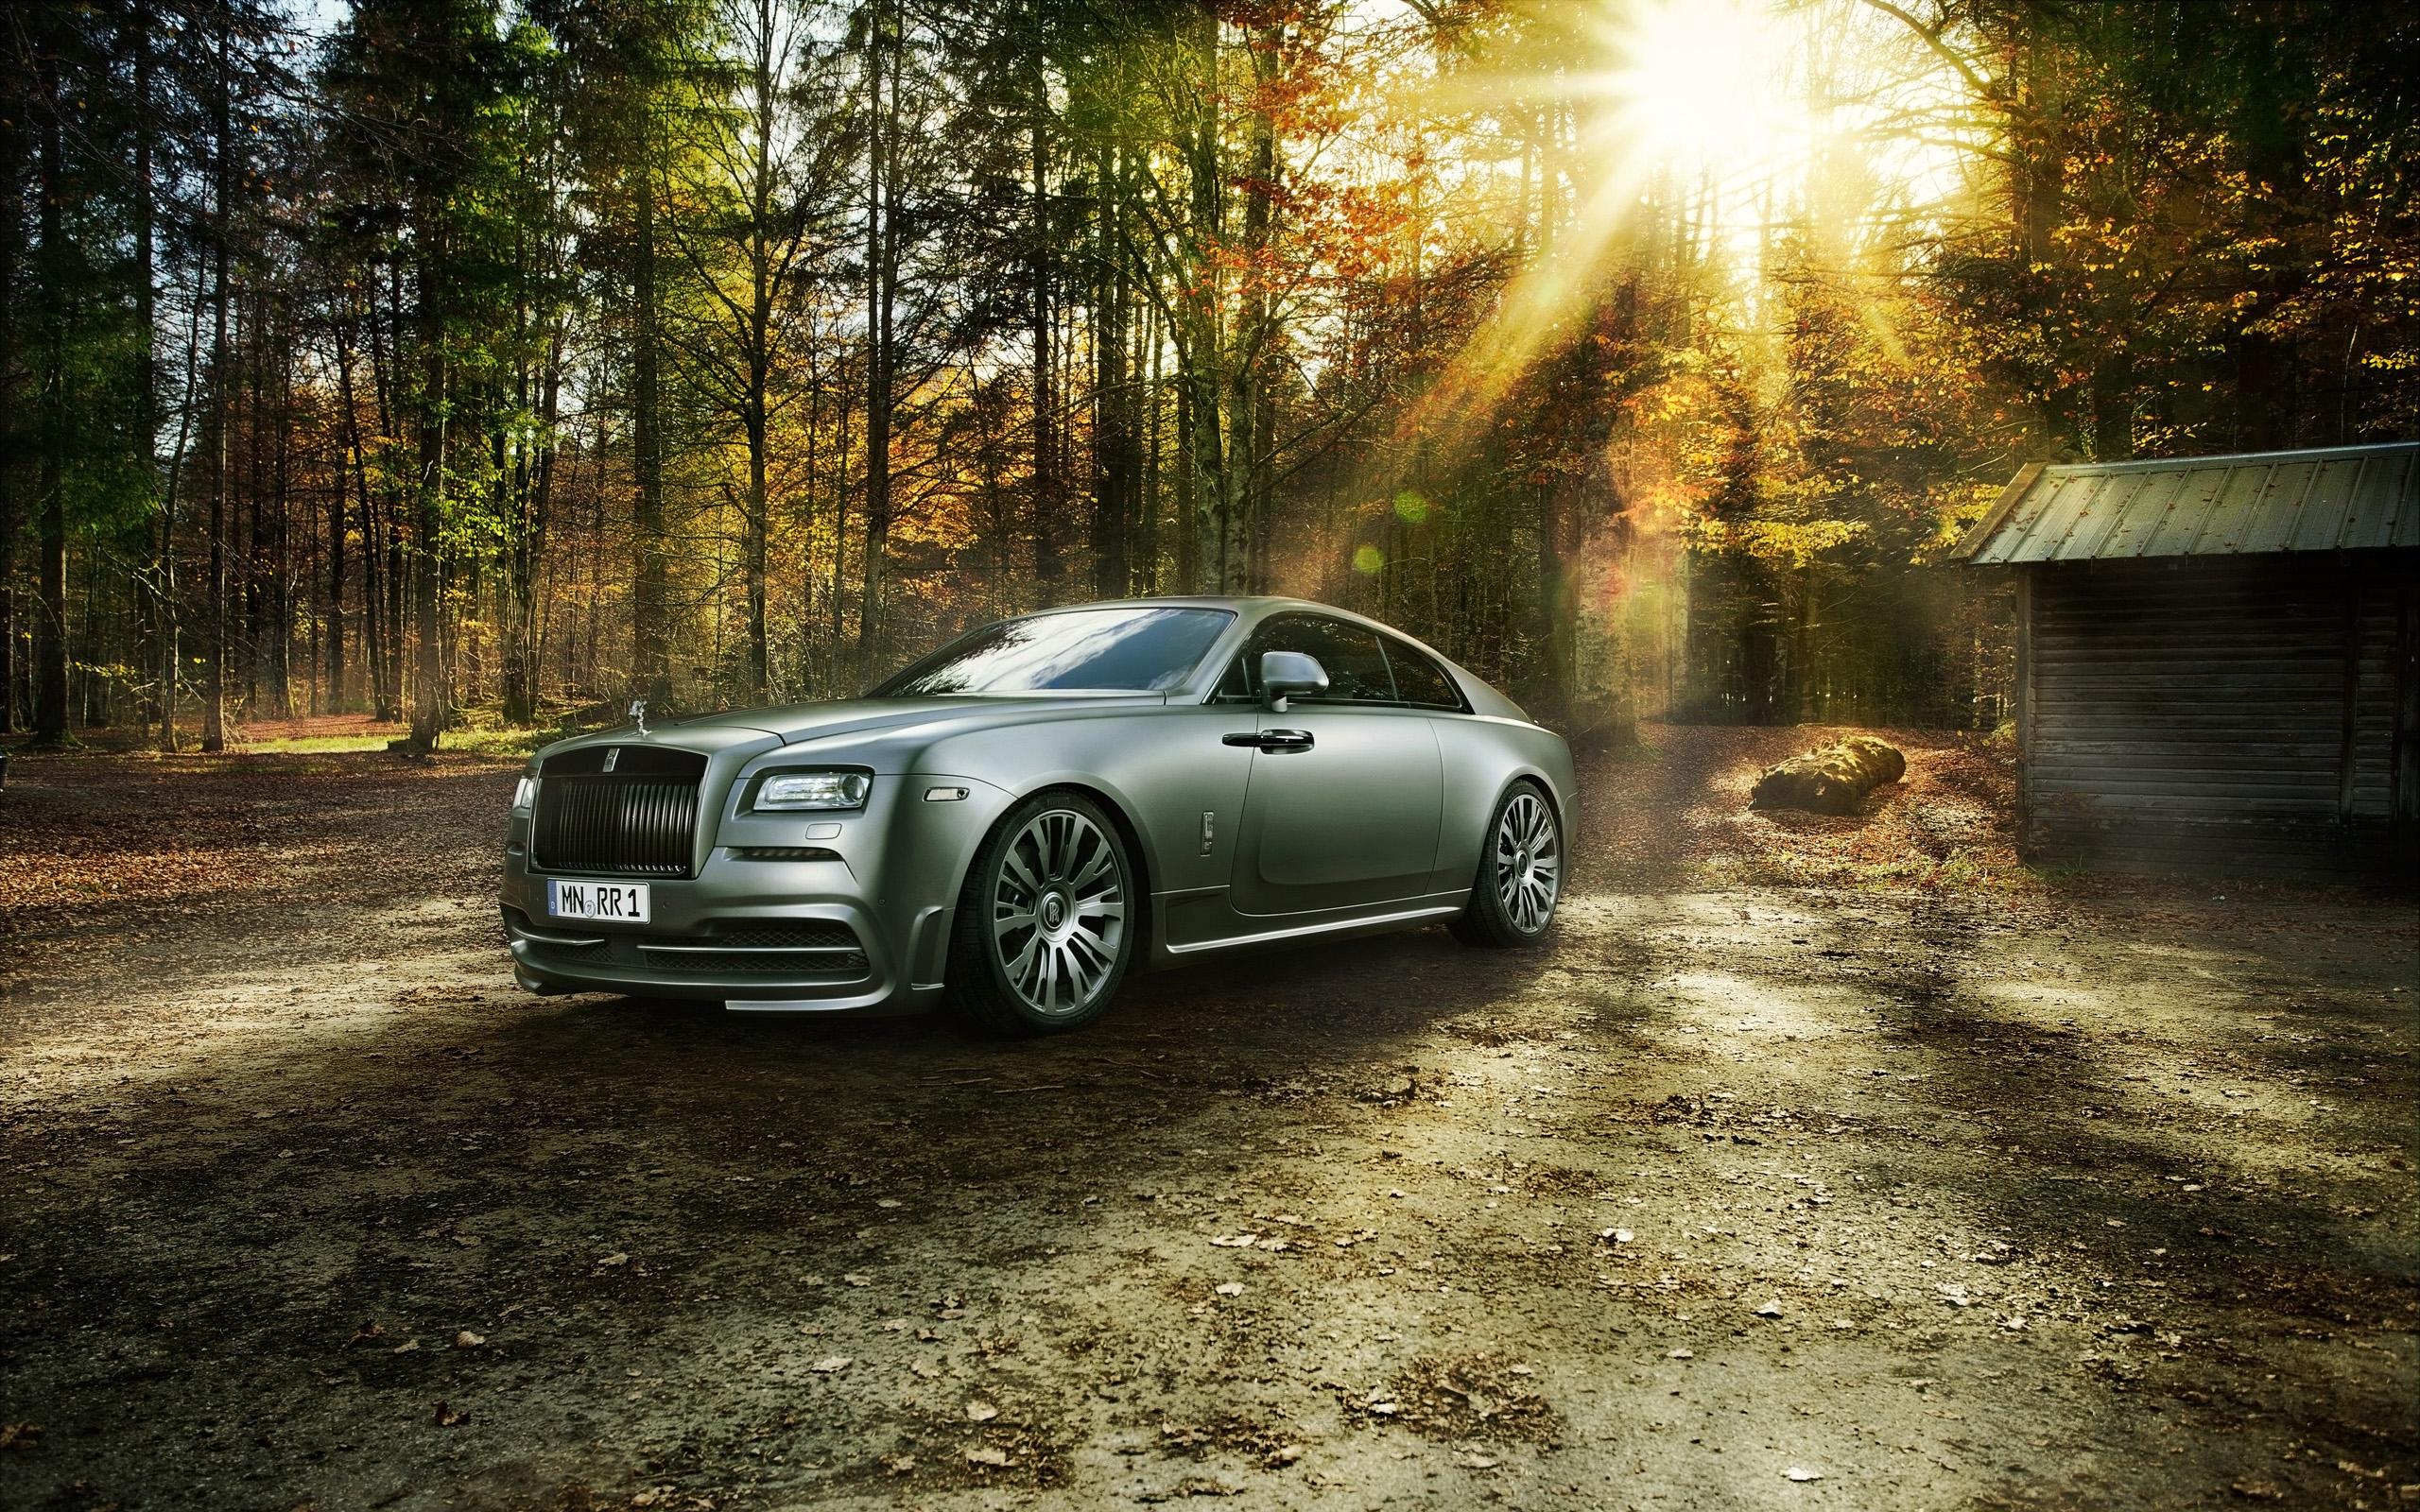 2014 spofec rolls royce wraith 2 wallpaper hd car - Rolls royce wallpaper download ...